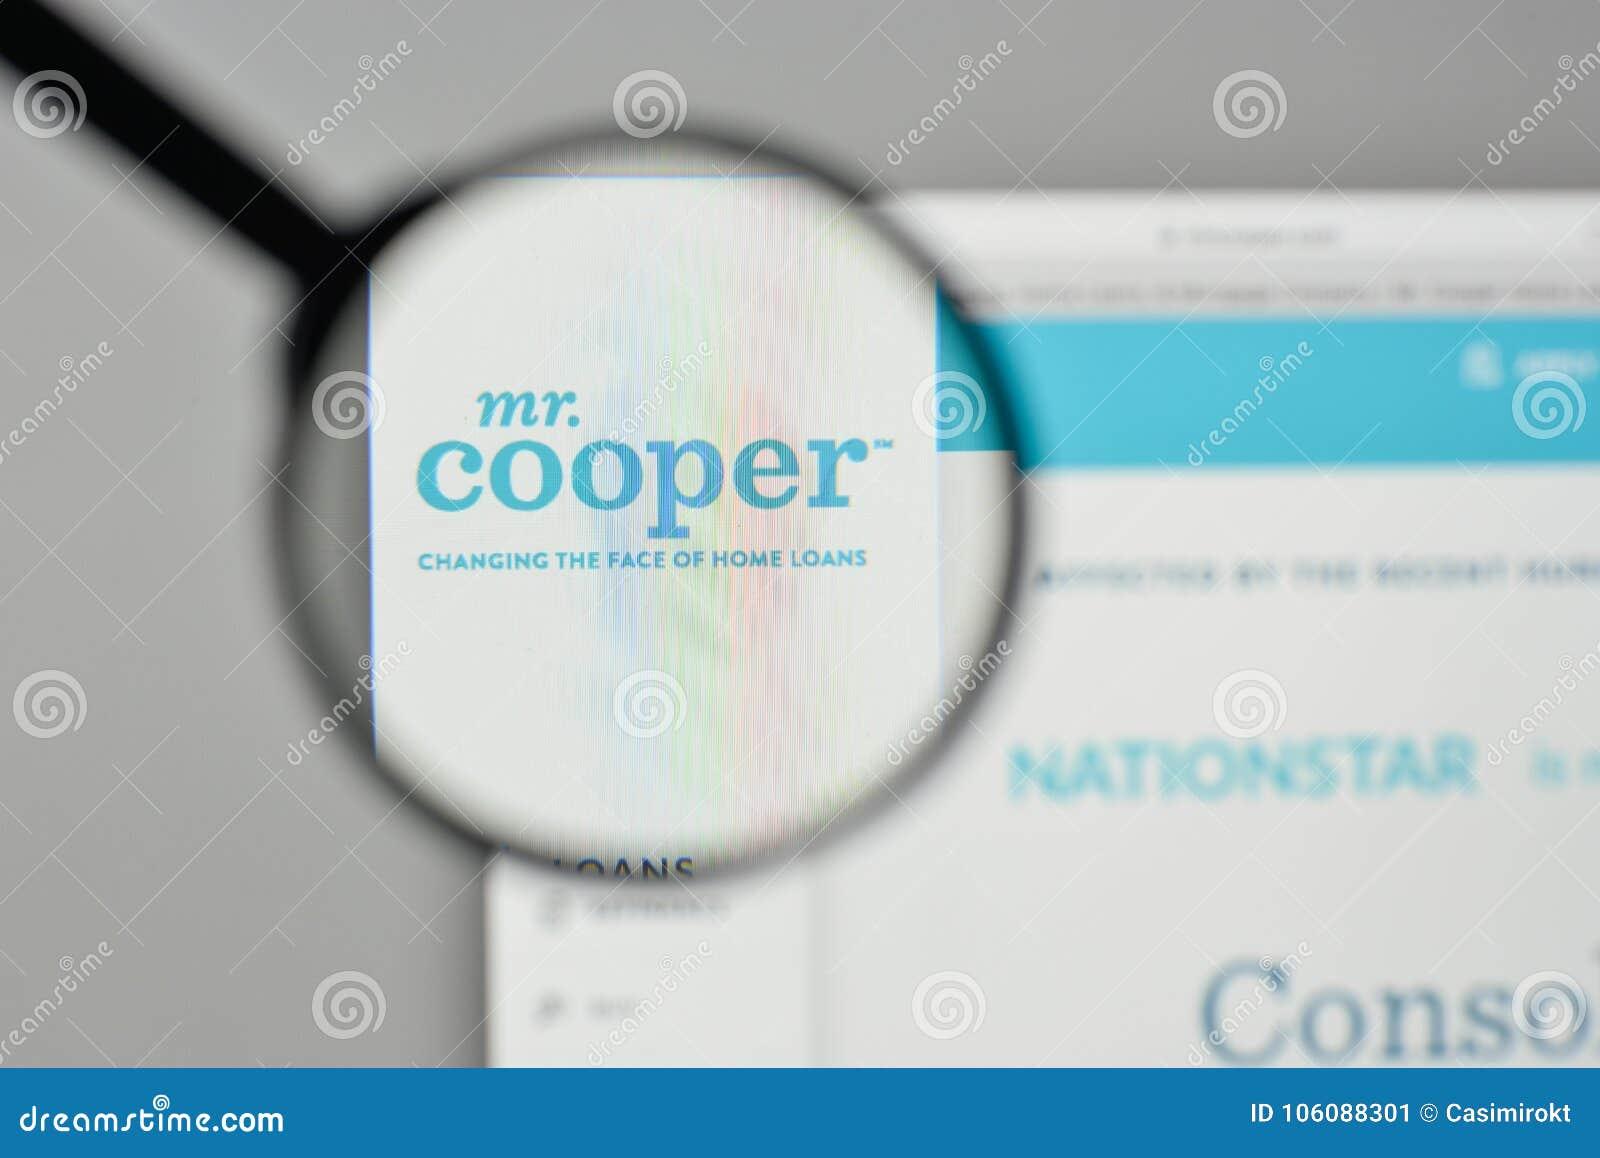 Milan, Italy - November 1, 2017: Mr Cooper - Nationstar Mortgage